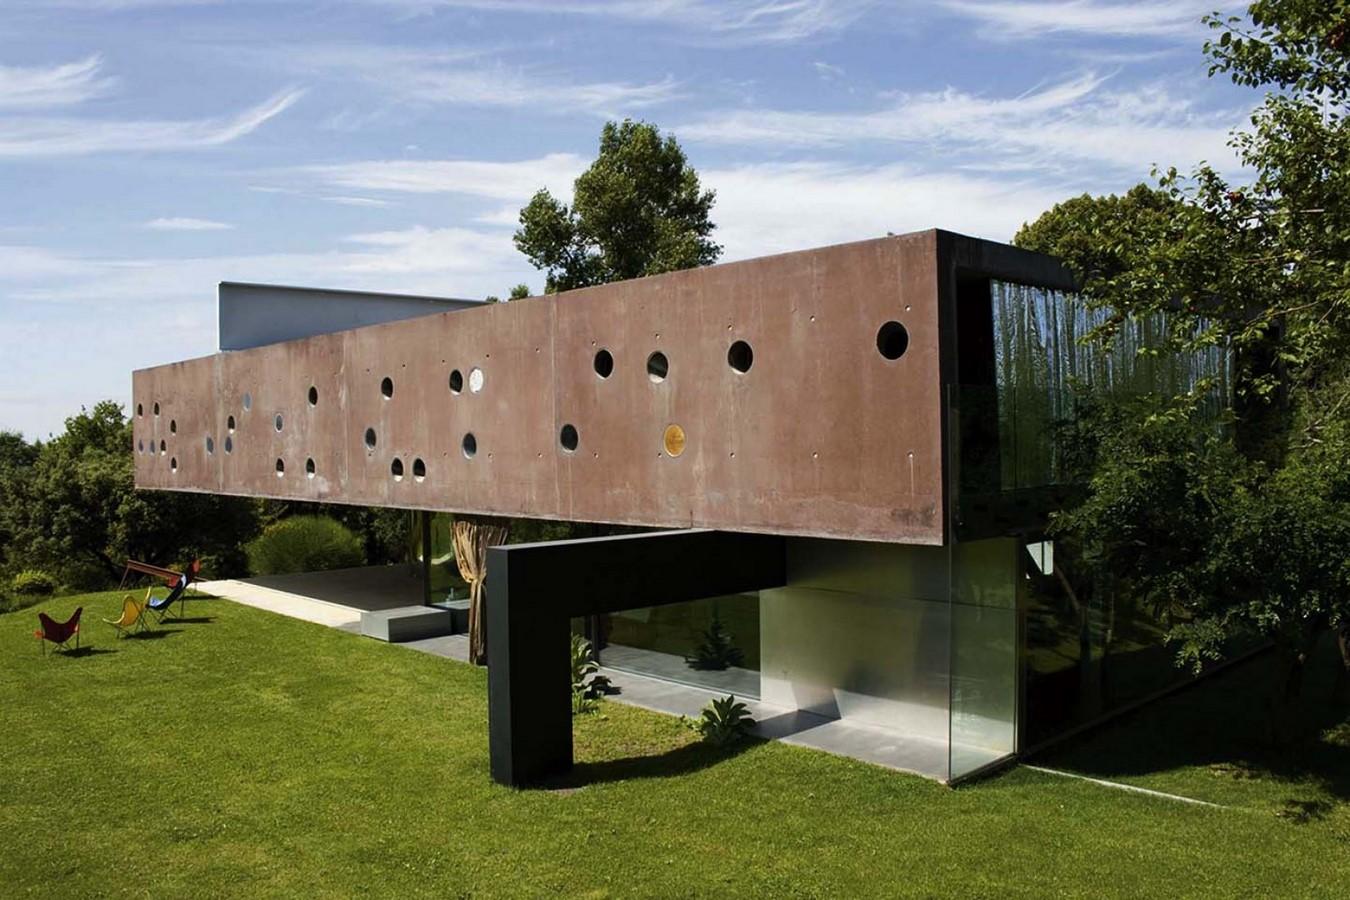 Maison Bordeaux by Rem Koolhaas: The living house - Sheet13